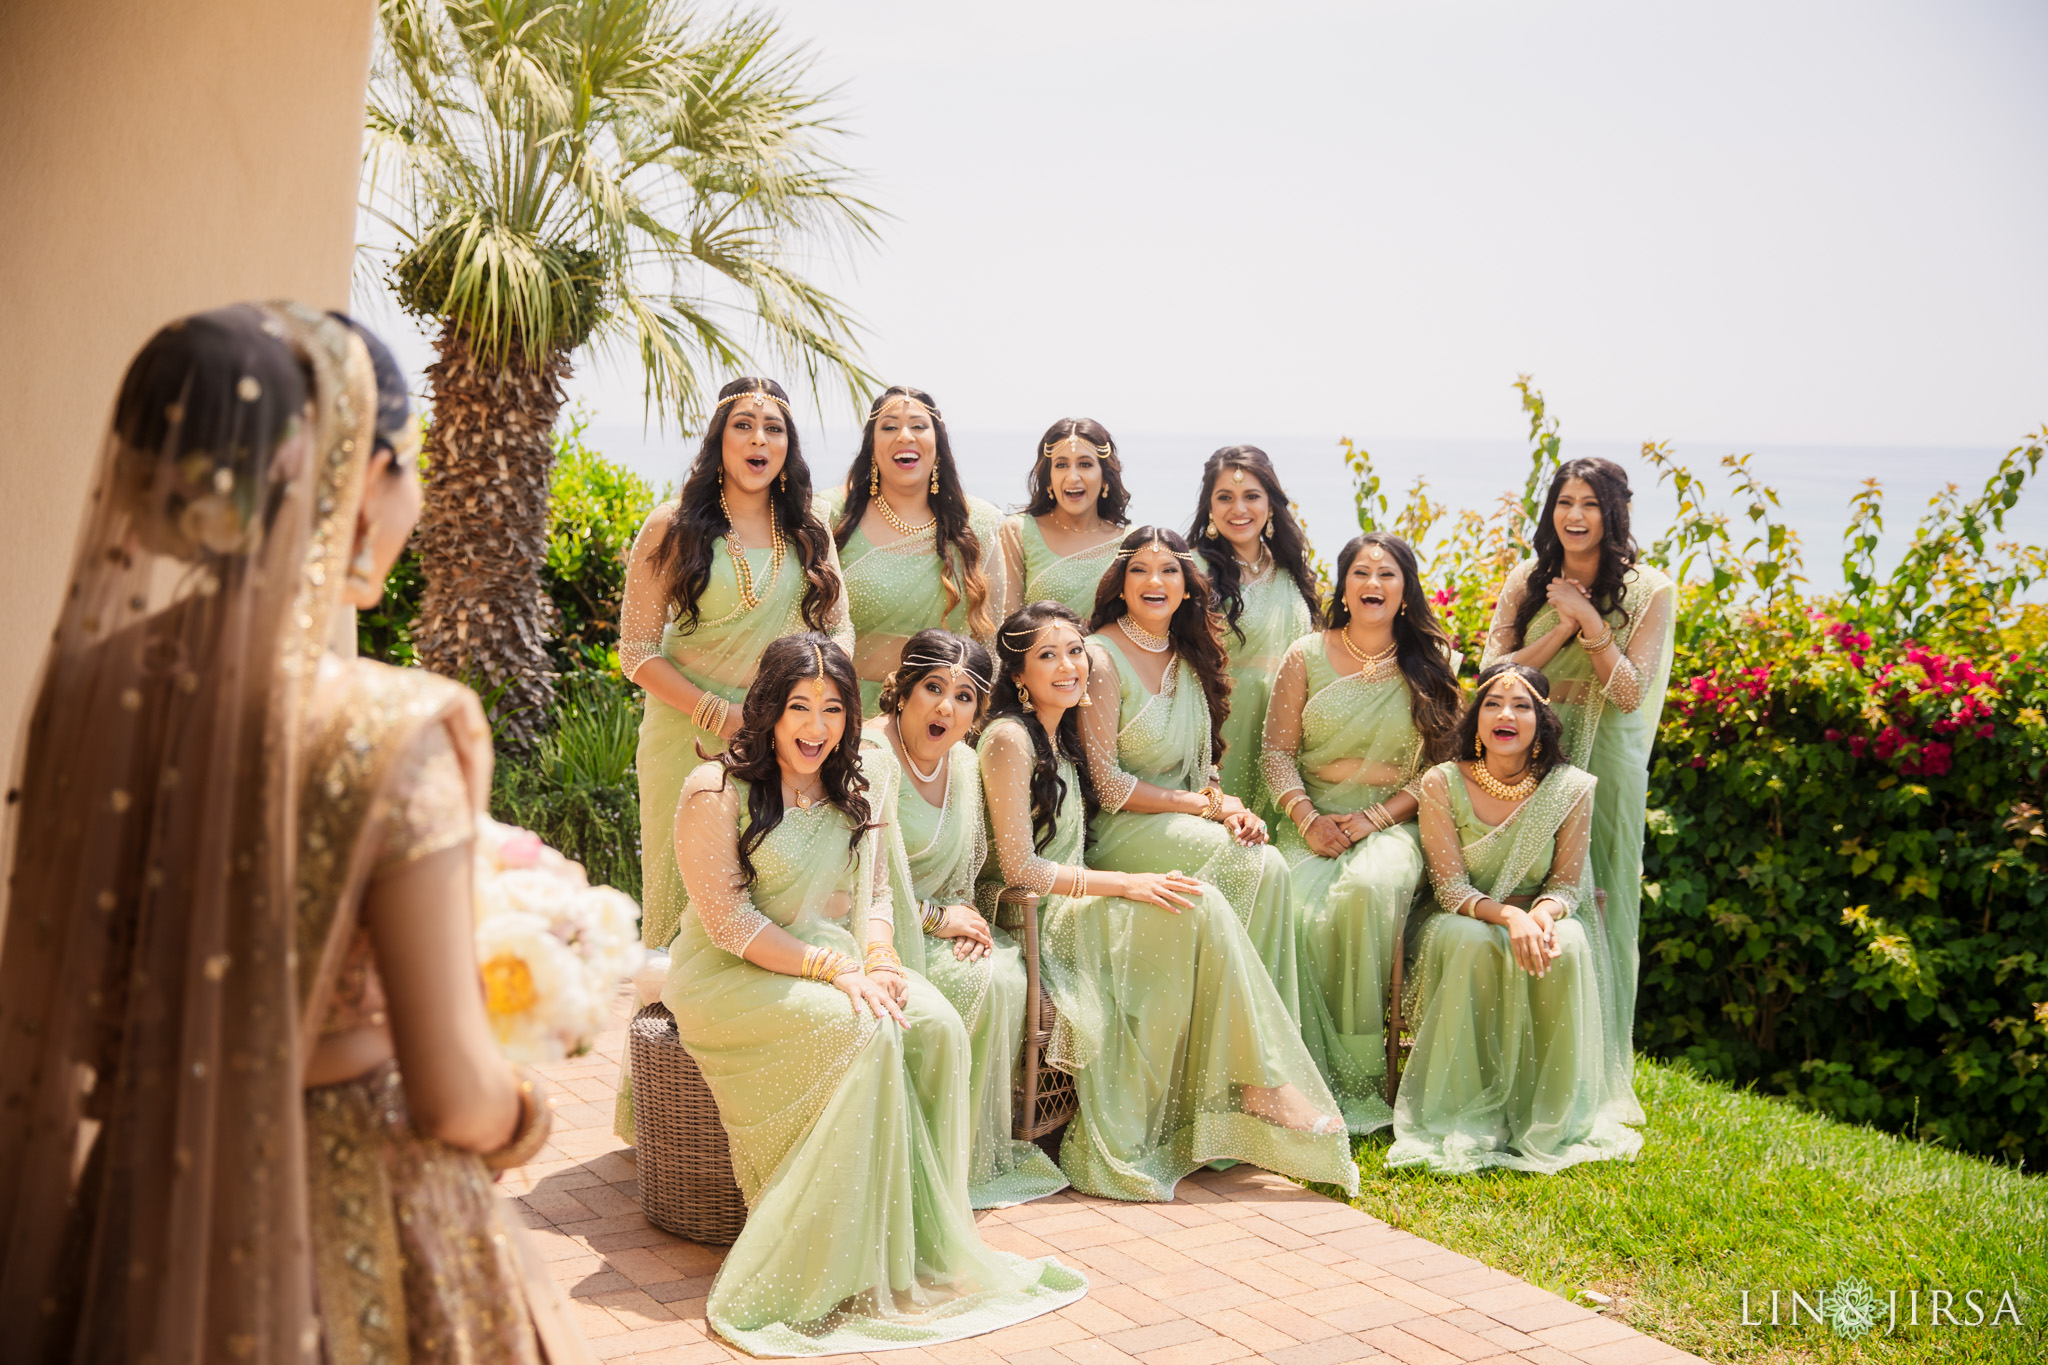 009 terranea resort palos verdes indian bridesmaids wedding photography